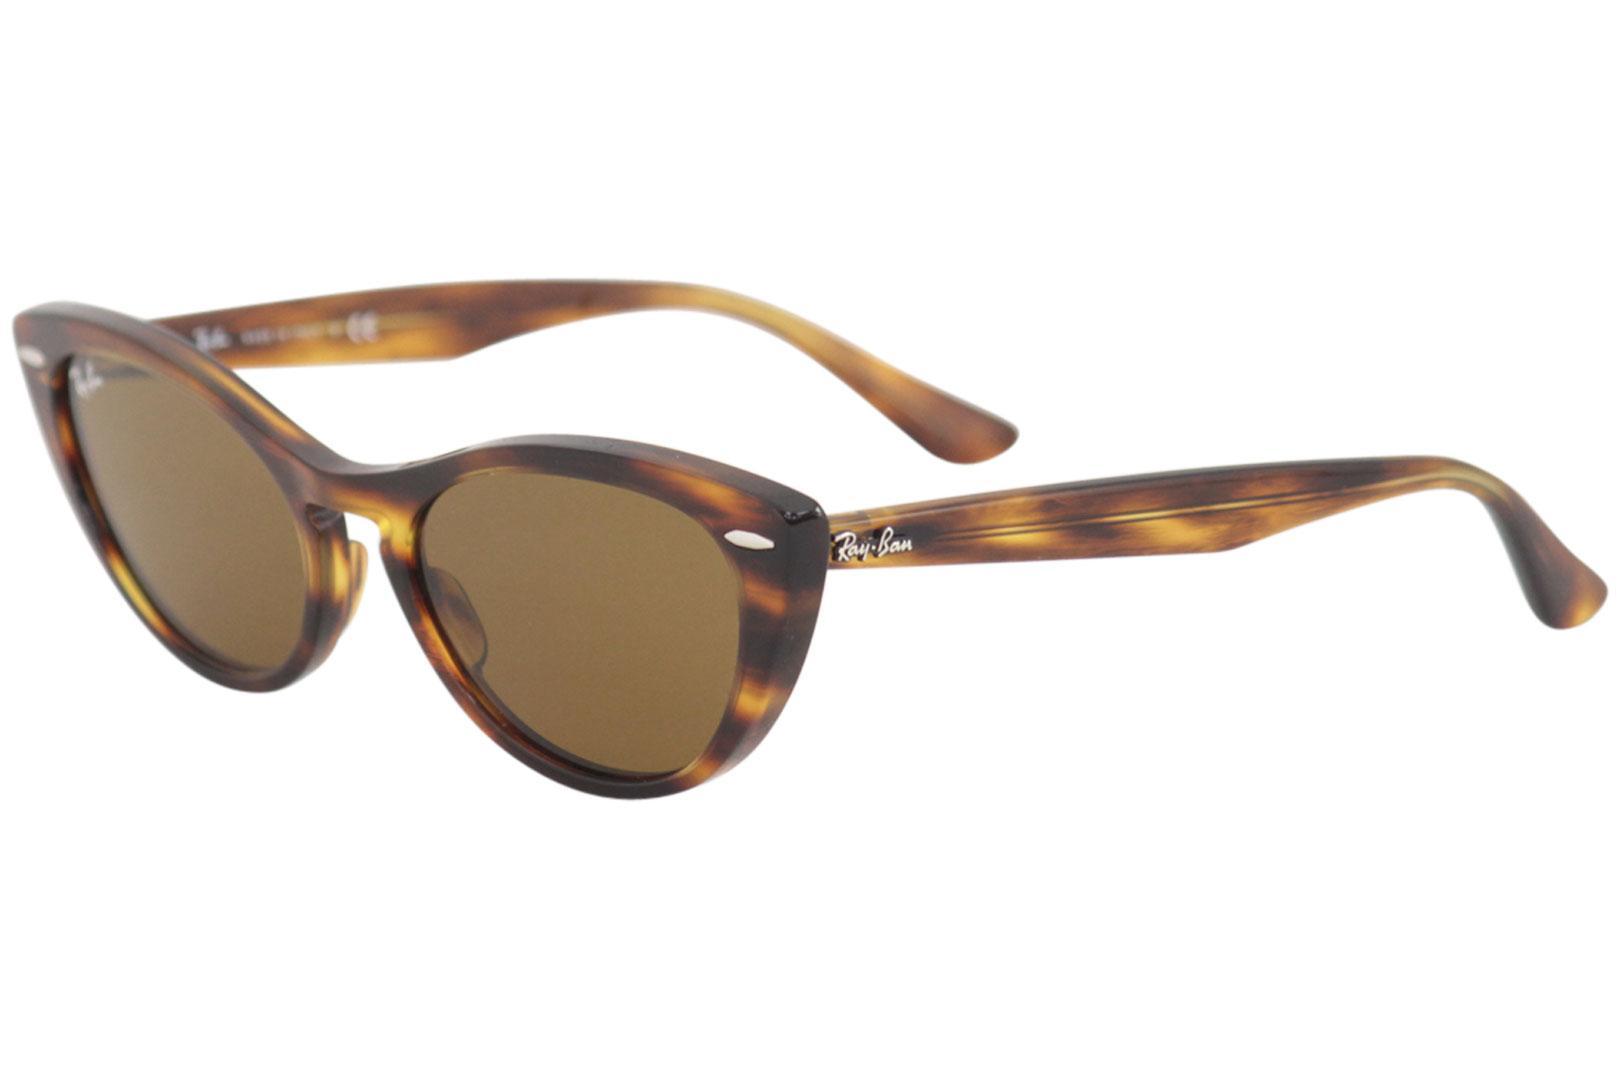 8f83dddc49 Ray Ban Women s Nina RB4314N RB 4314 N Fashion Cat Eye RayBan Sunglasses by Ray  Ban